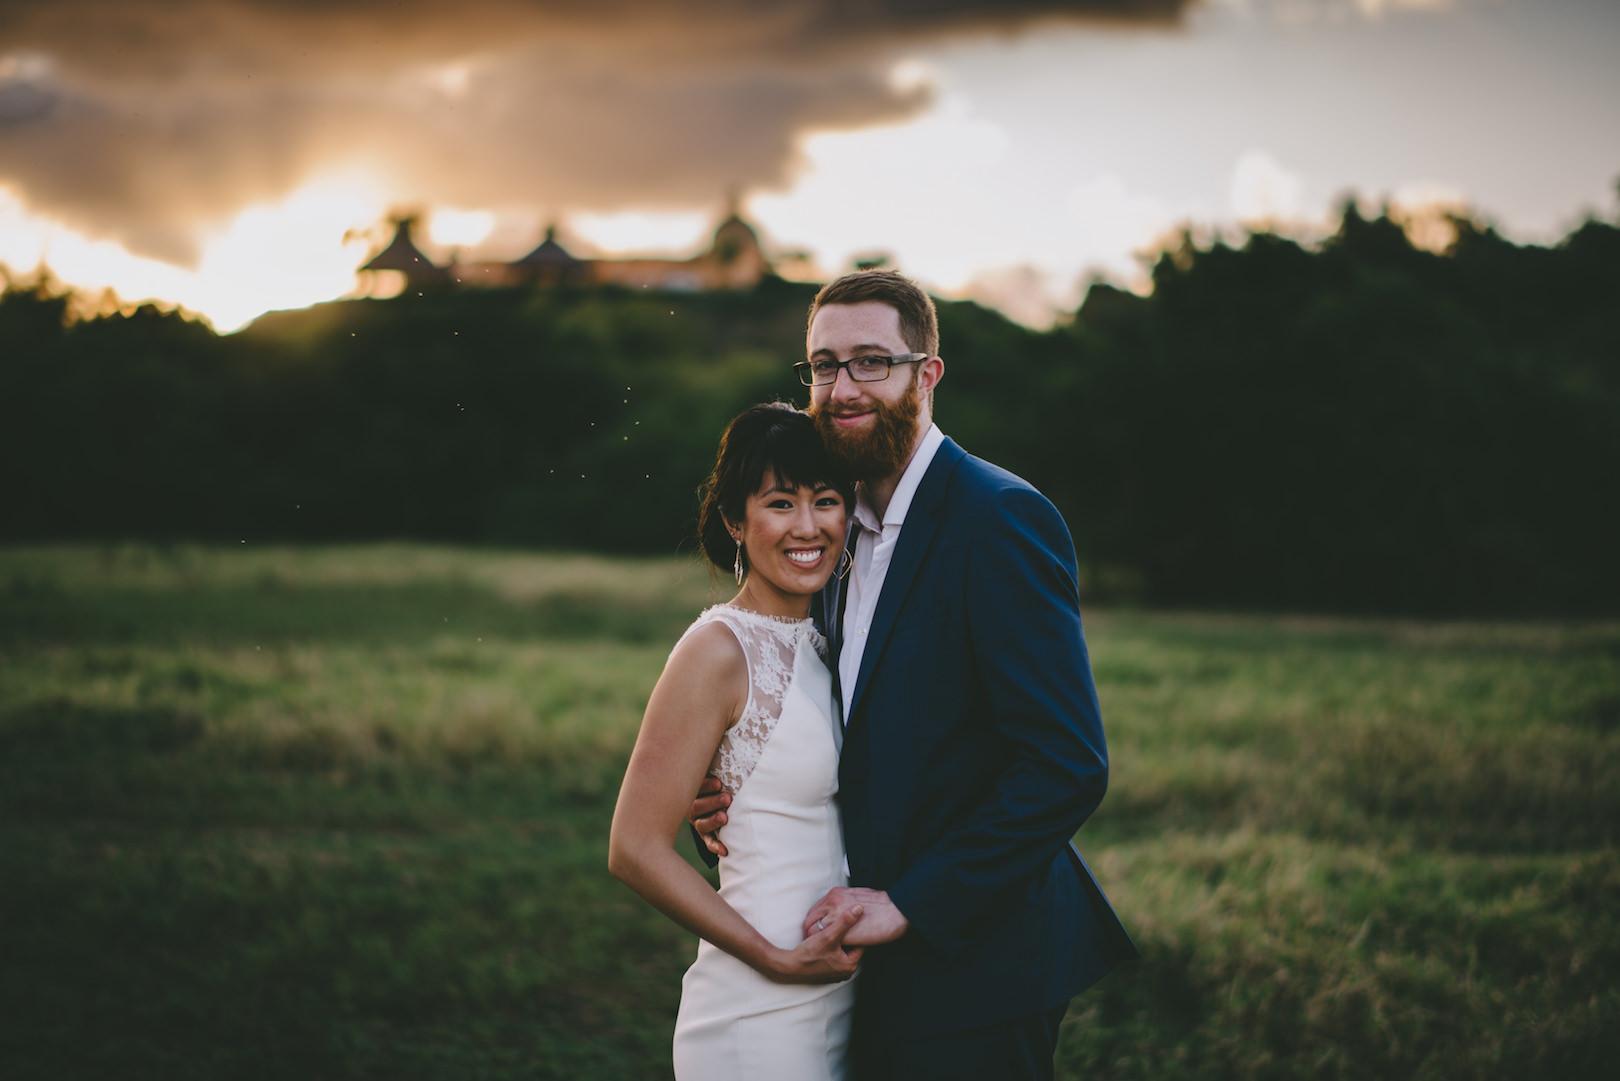 Nathan & Felicia - Wedding Day - © Dallas Kolotylo Photography - 572